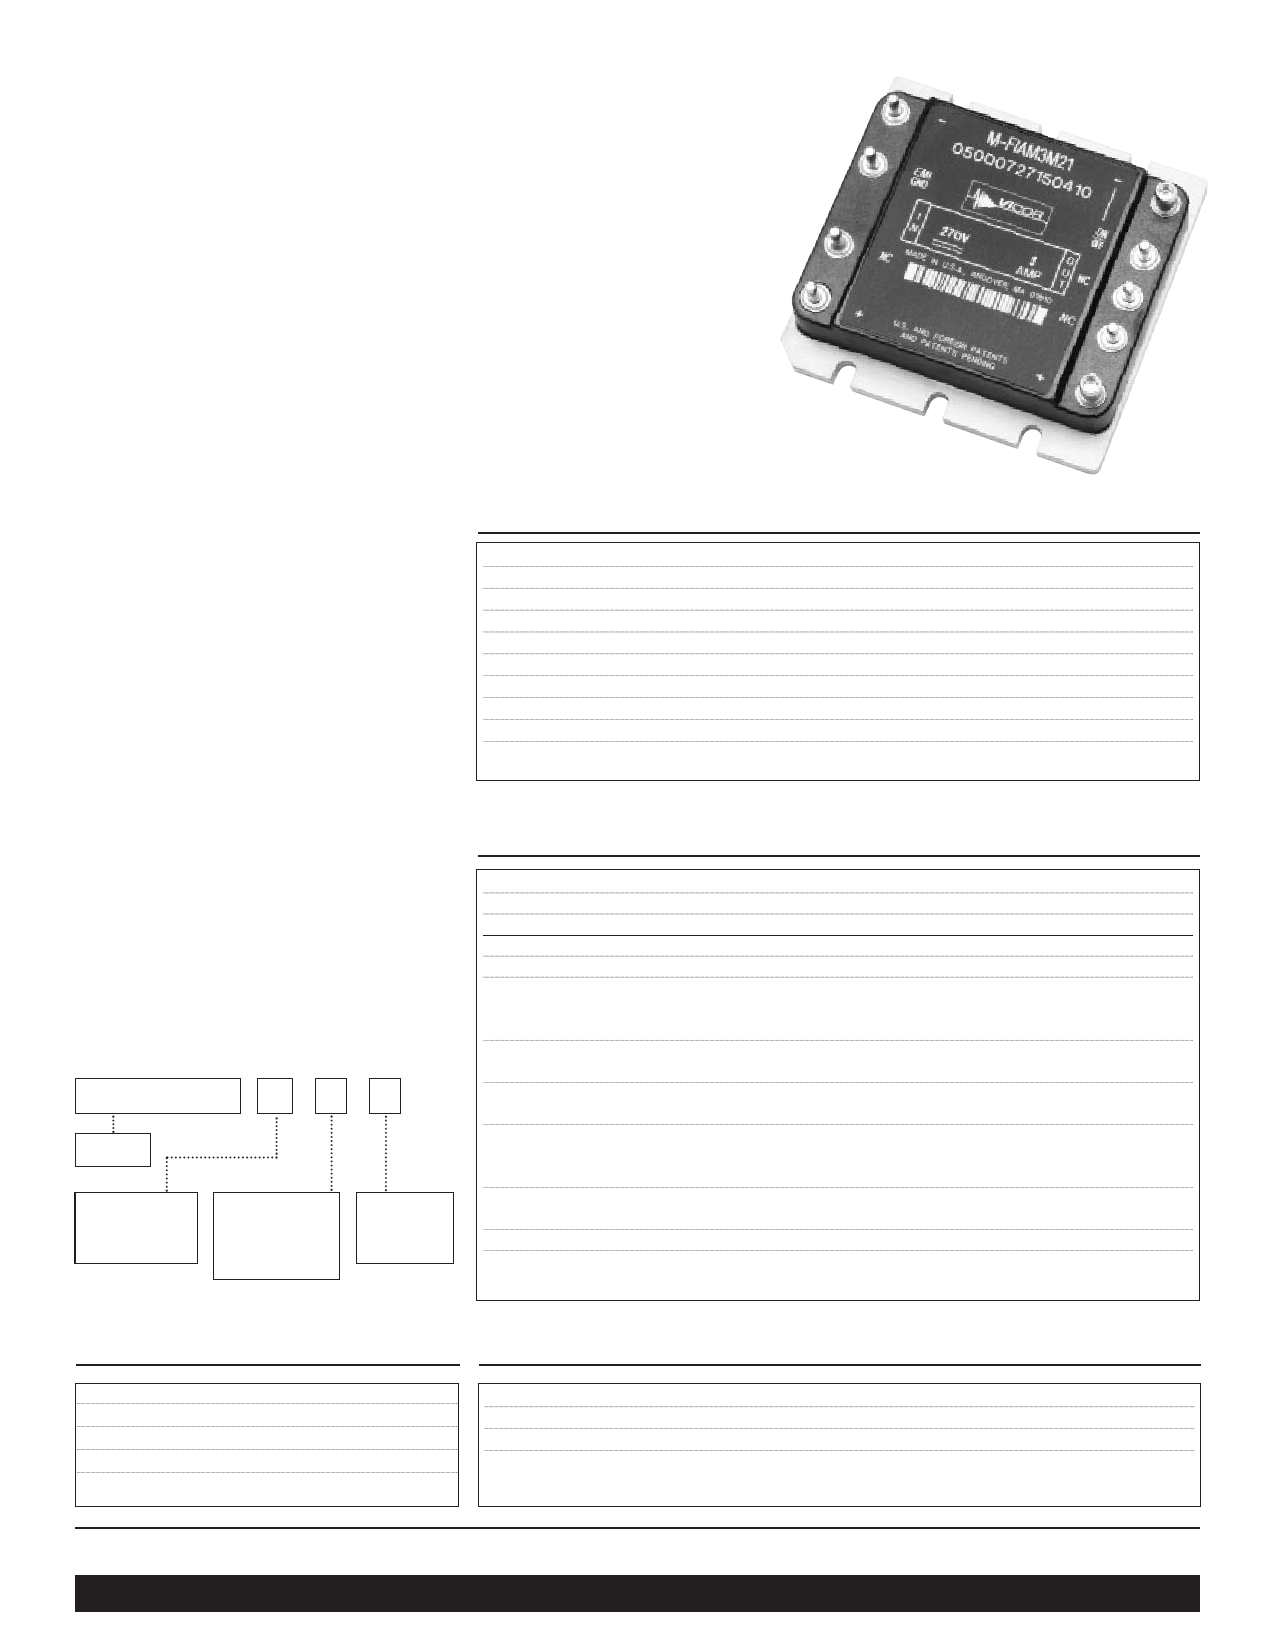 M-FIAM3M13 datasheet